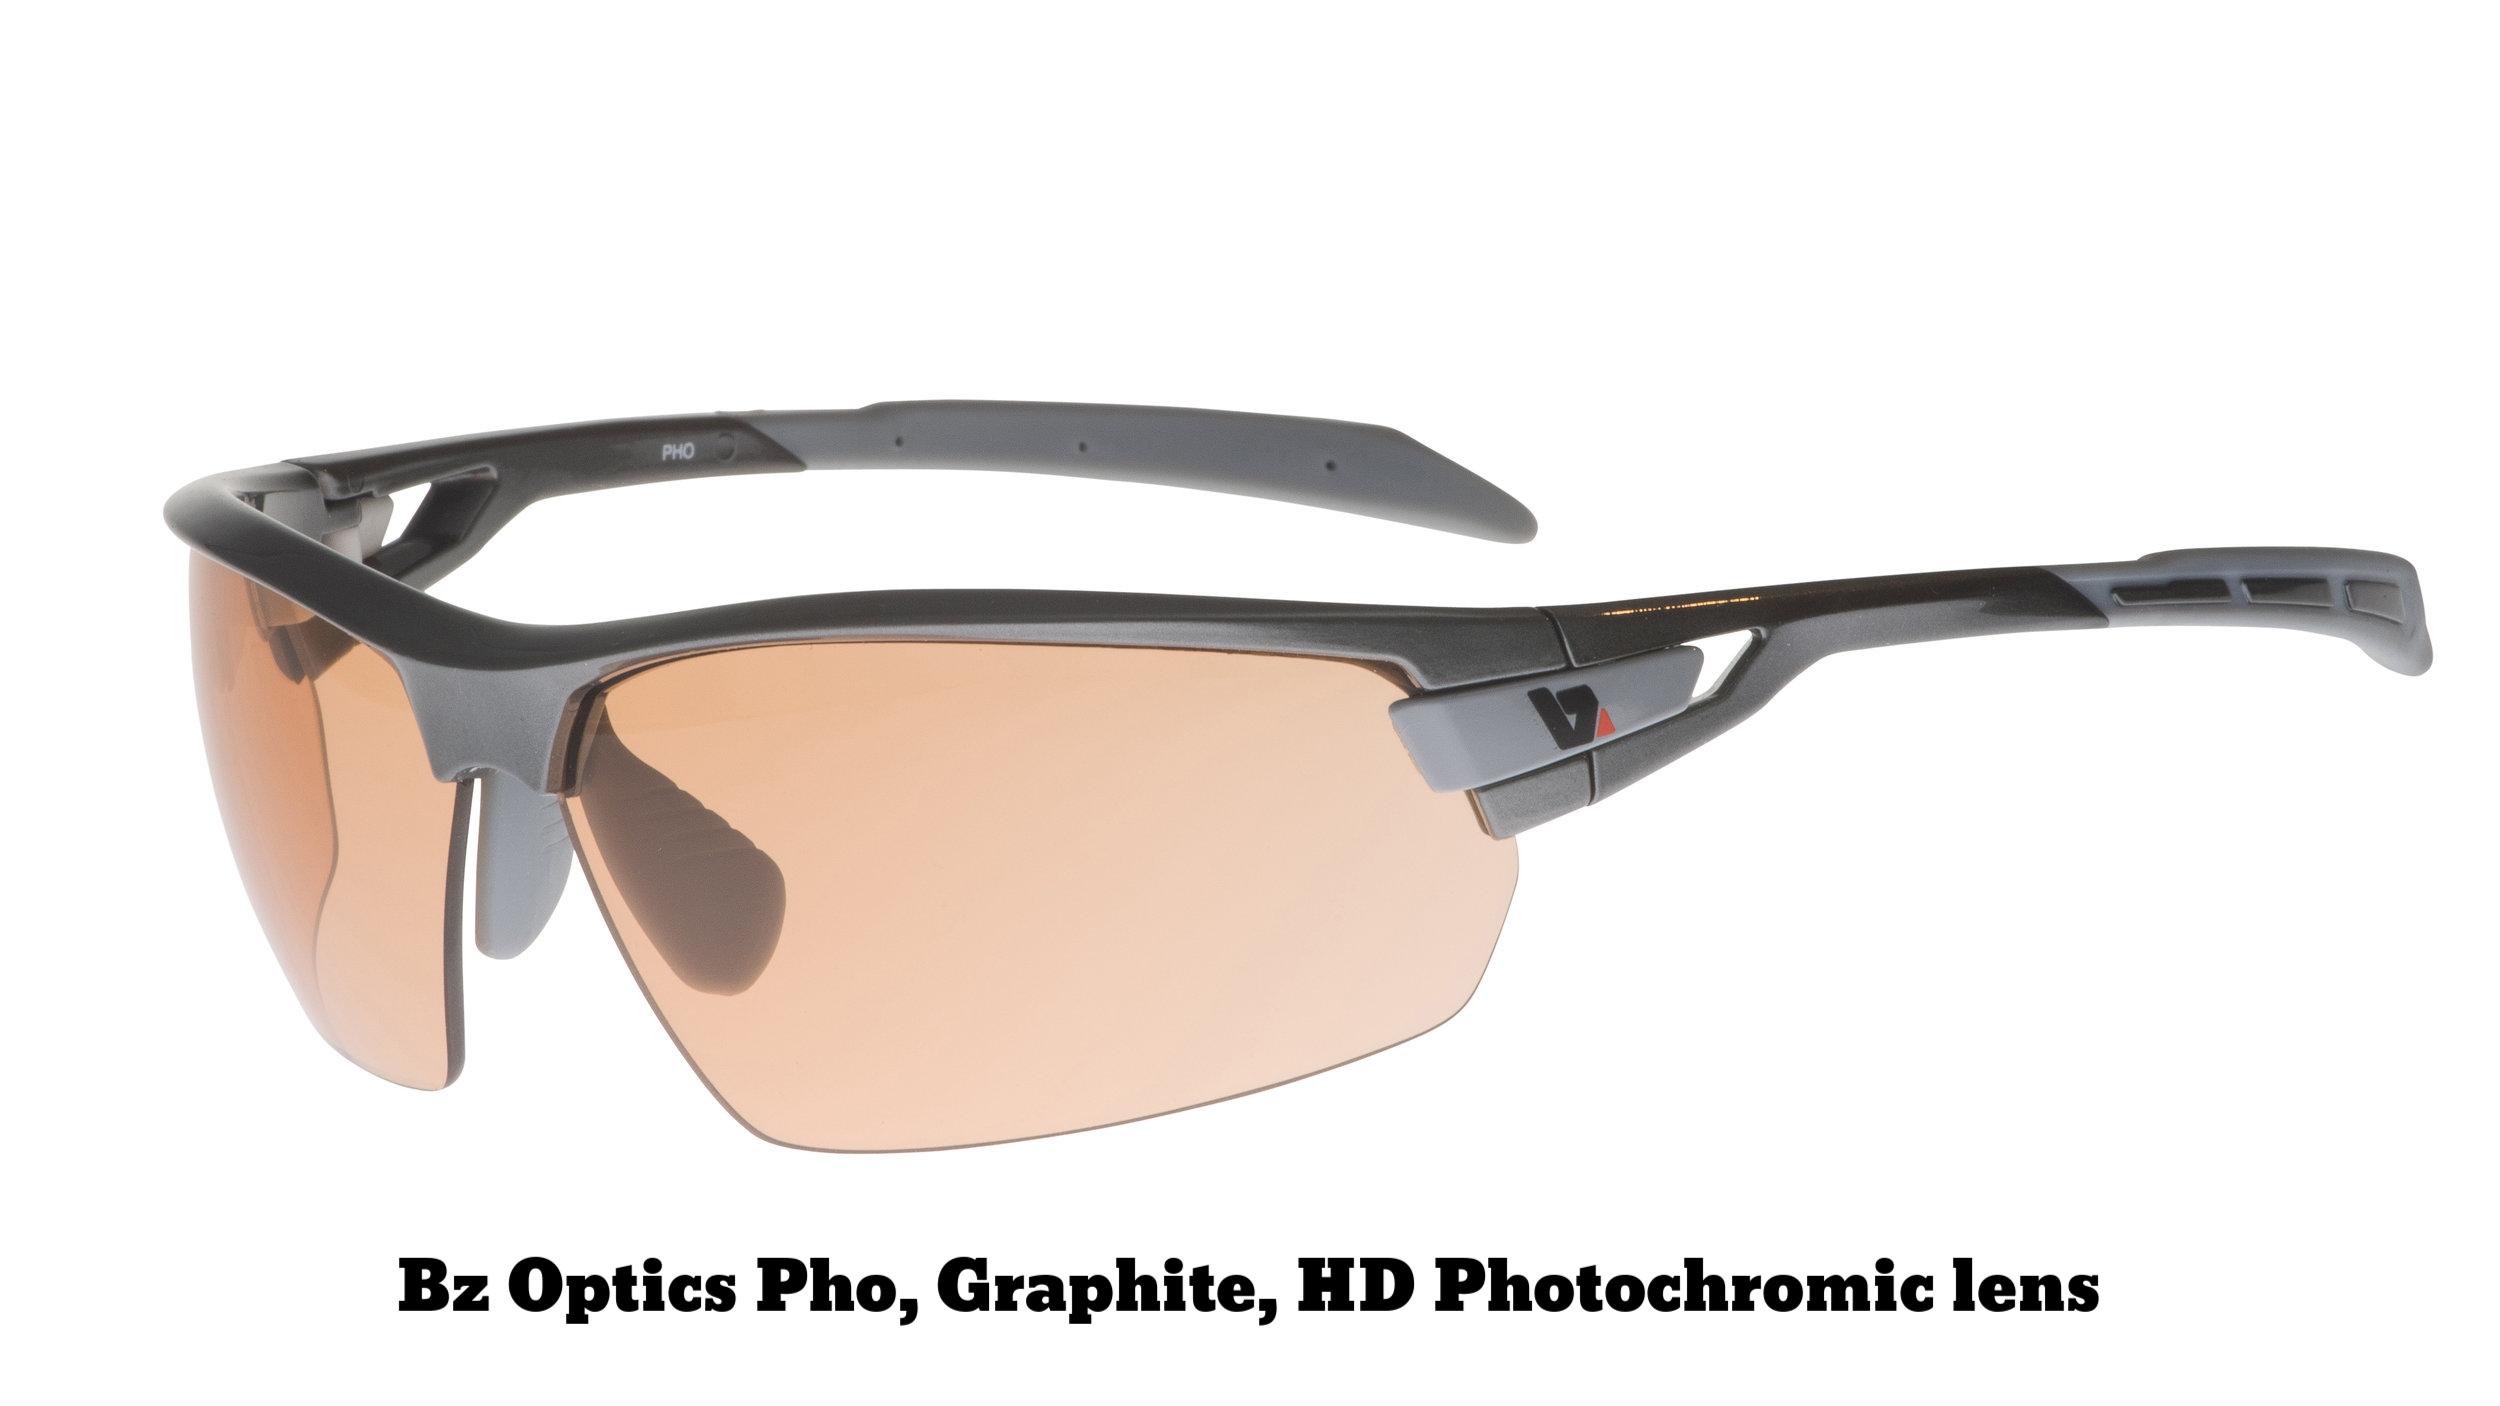 Pho graphite hd photochromic